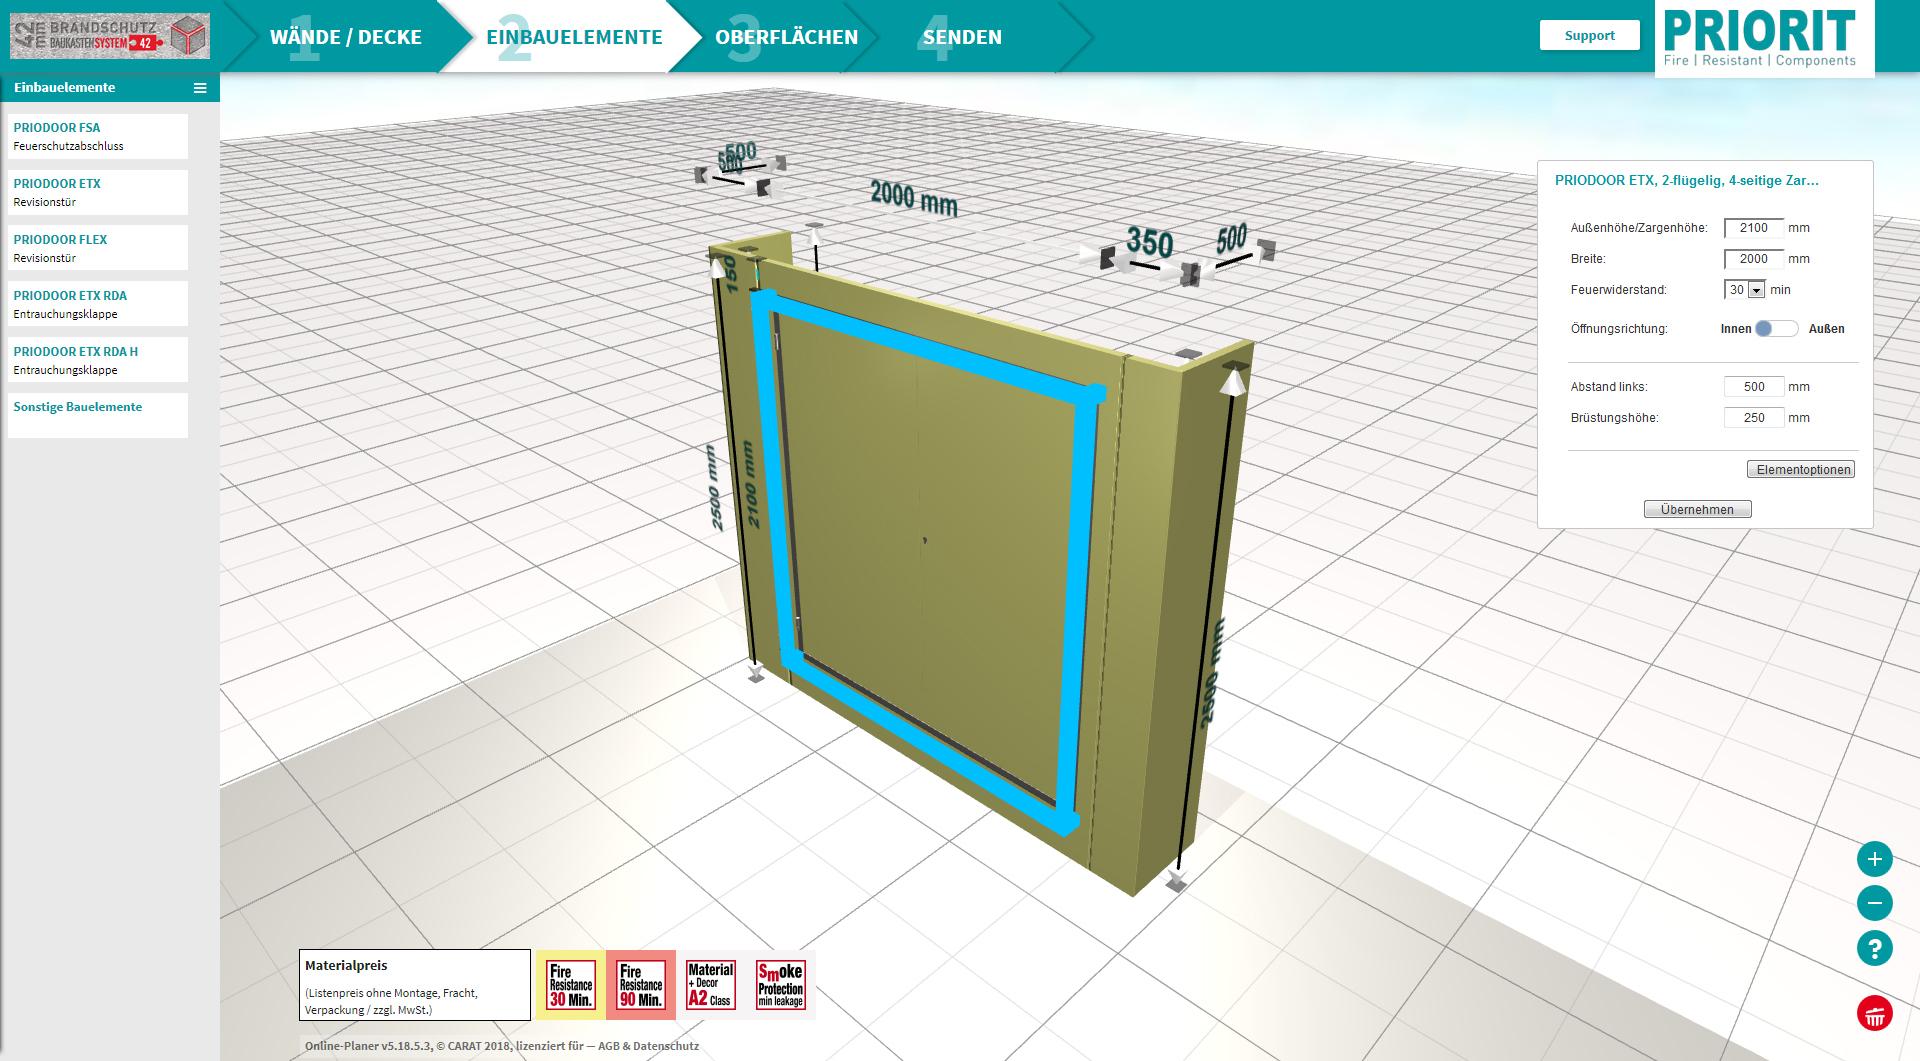 Tab Service Download Center 3d Online Planungstool Von Priorit